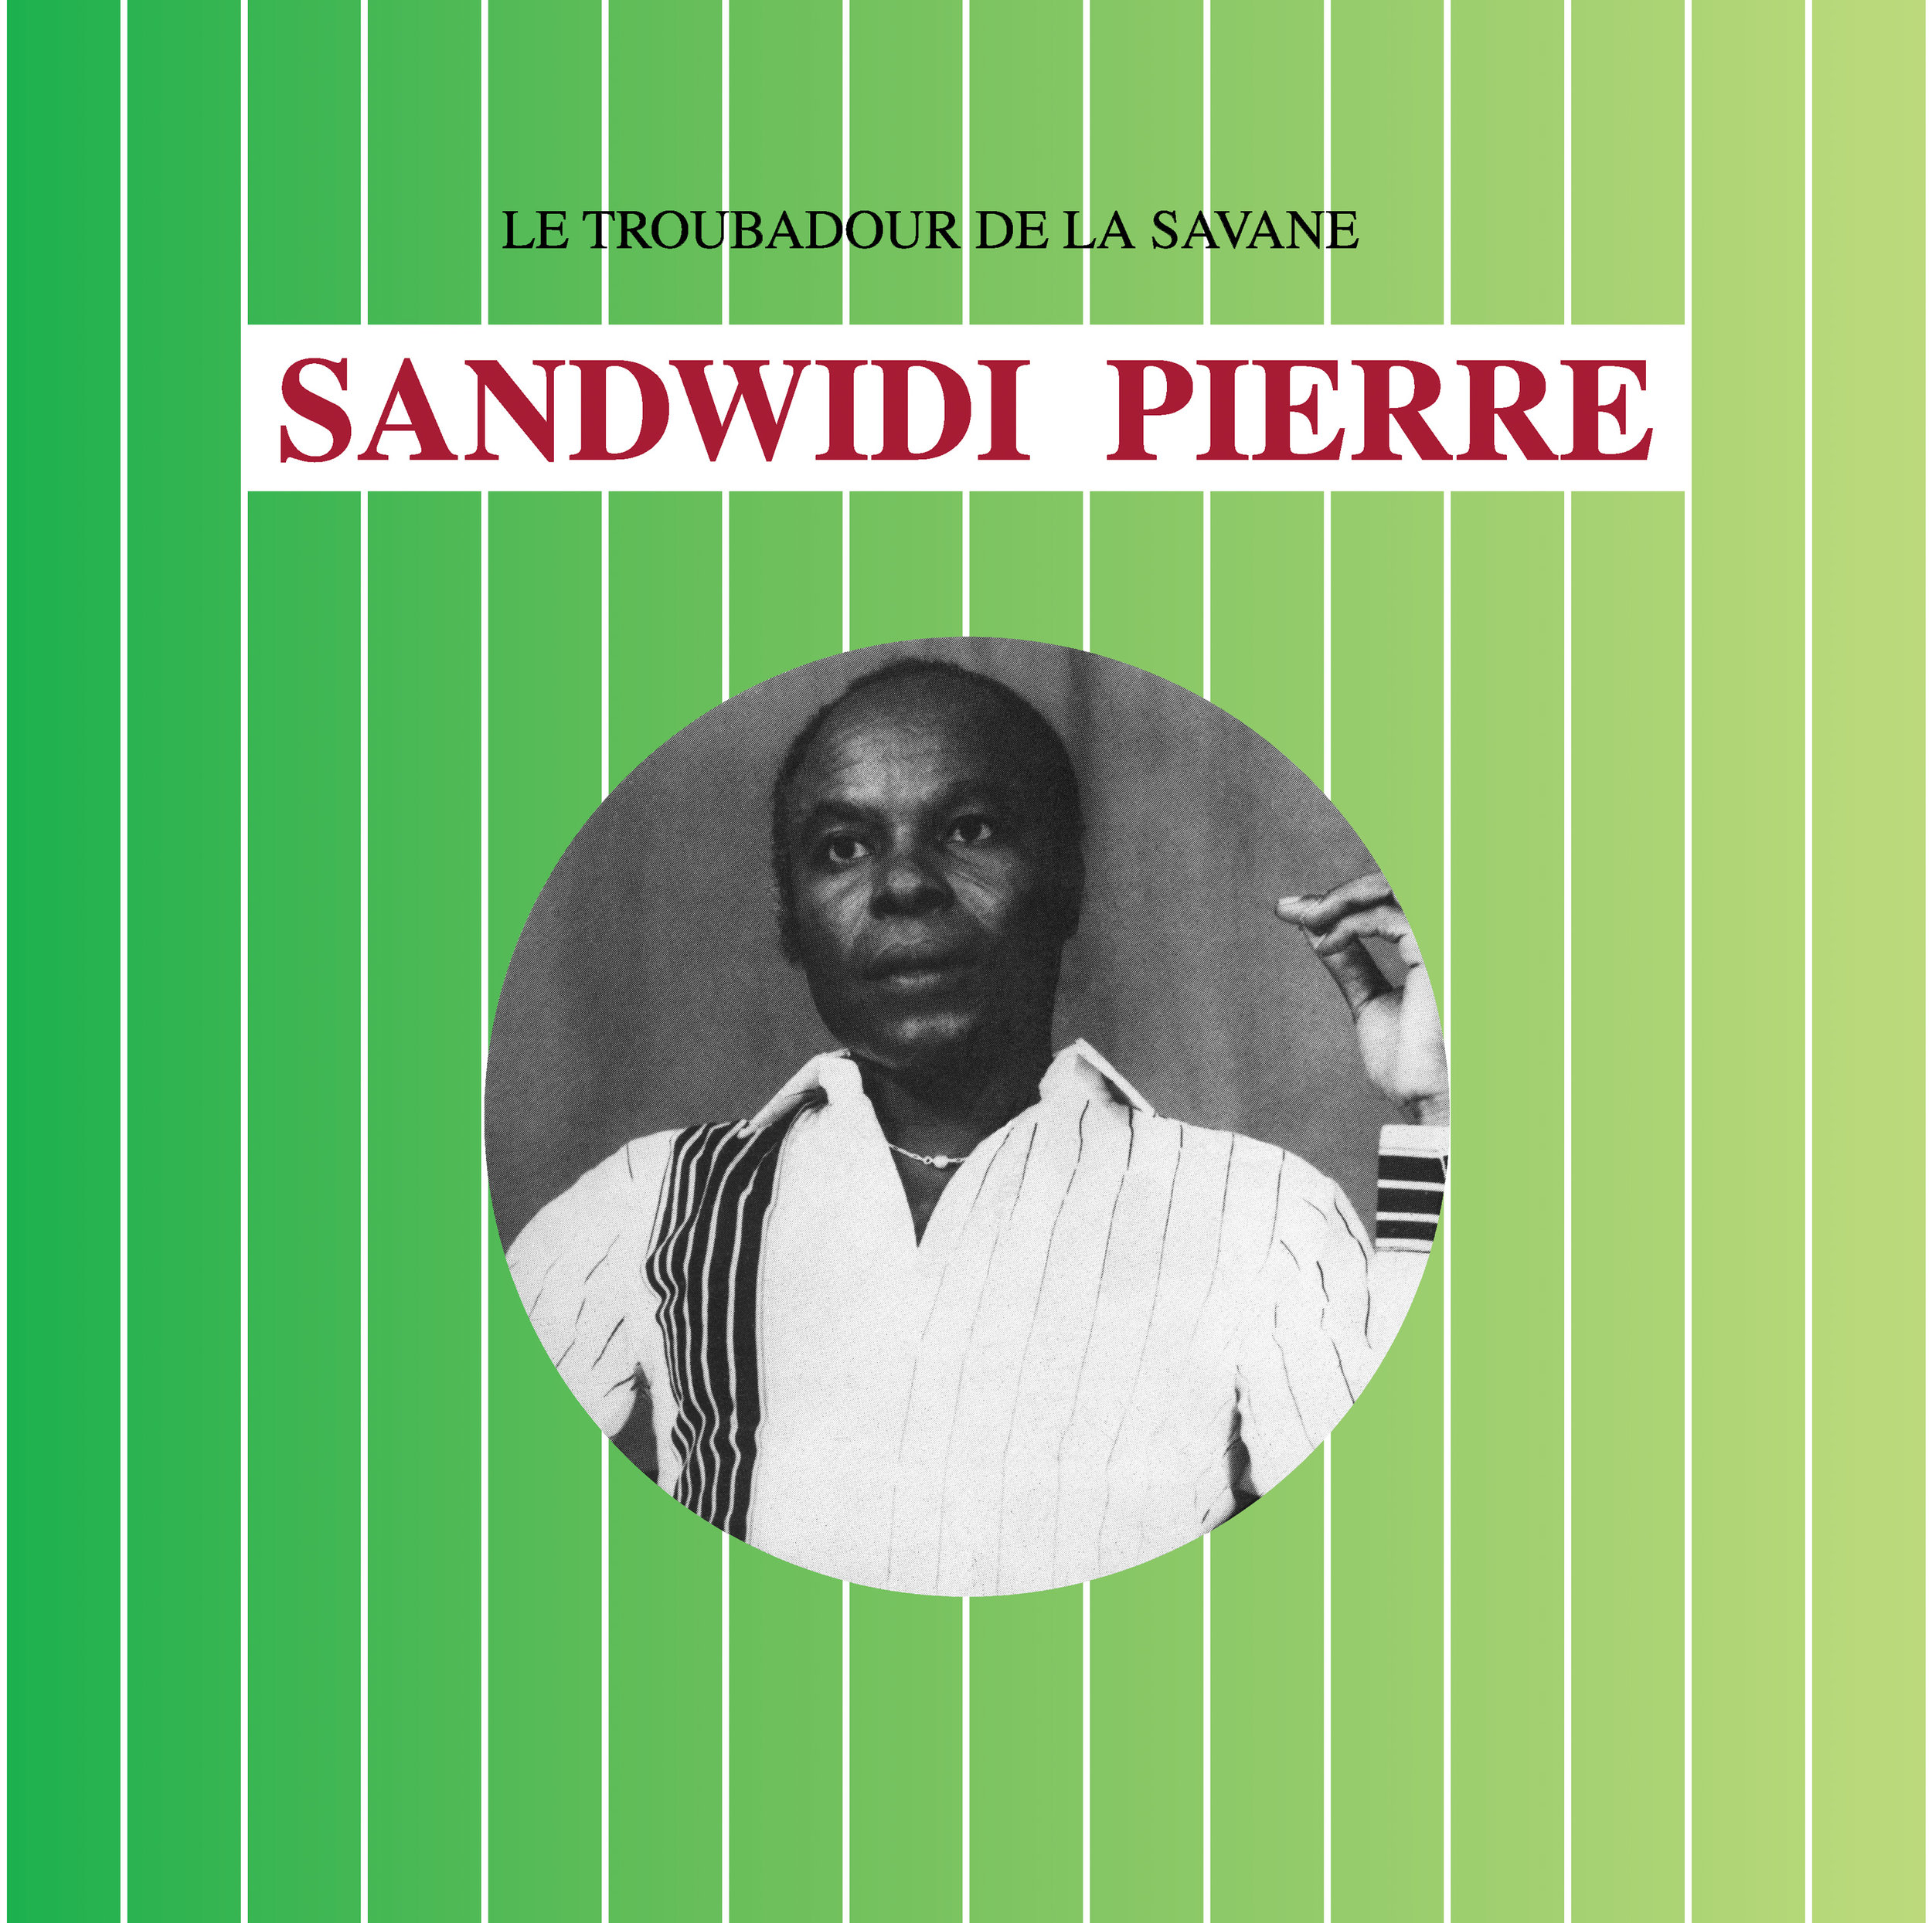 Sandwidi Pierre Cover.jpg